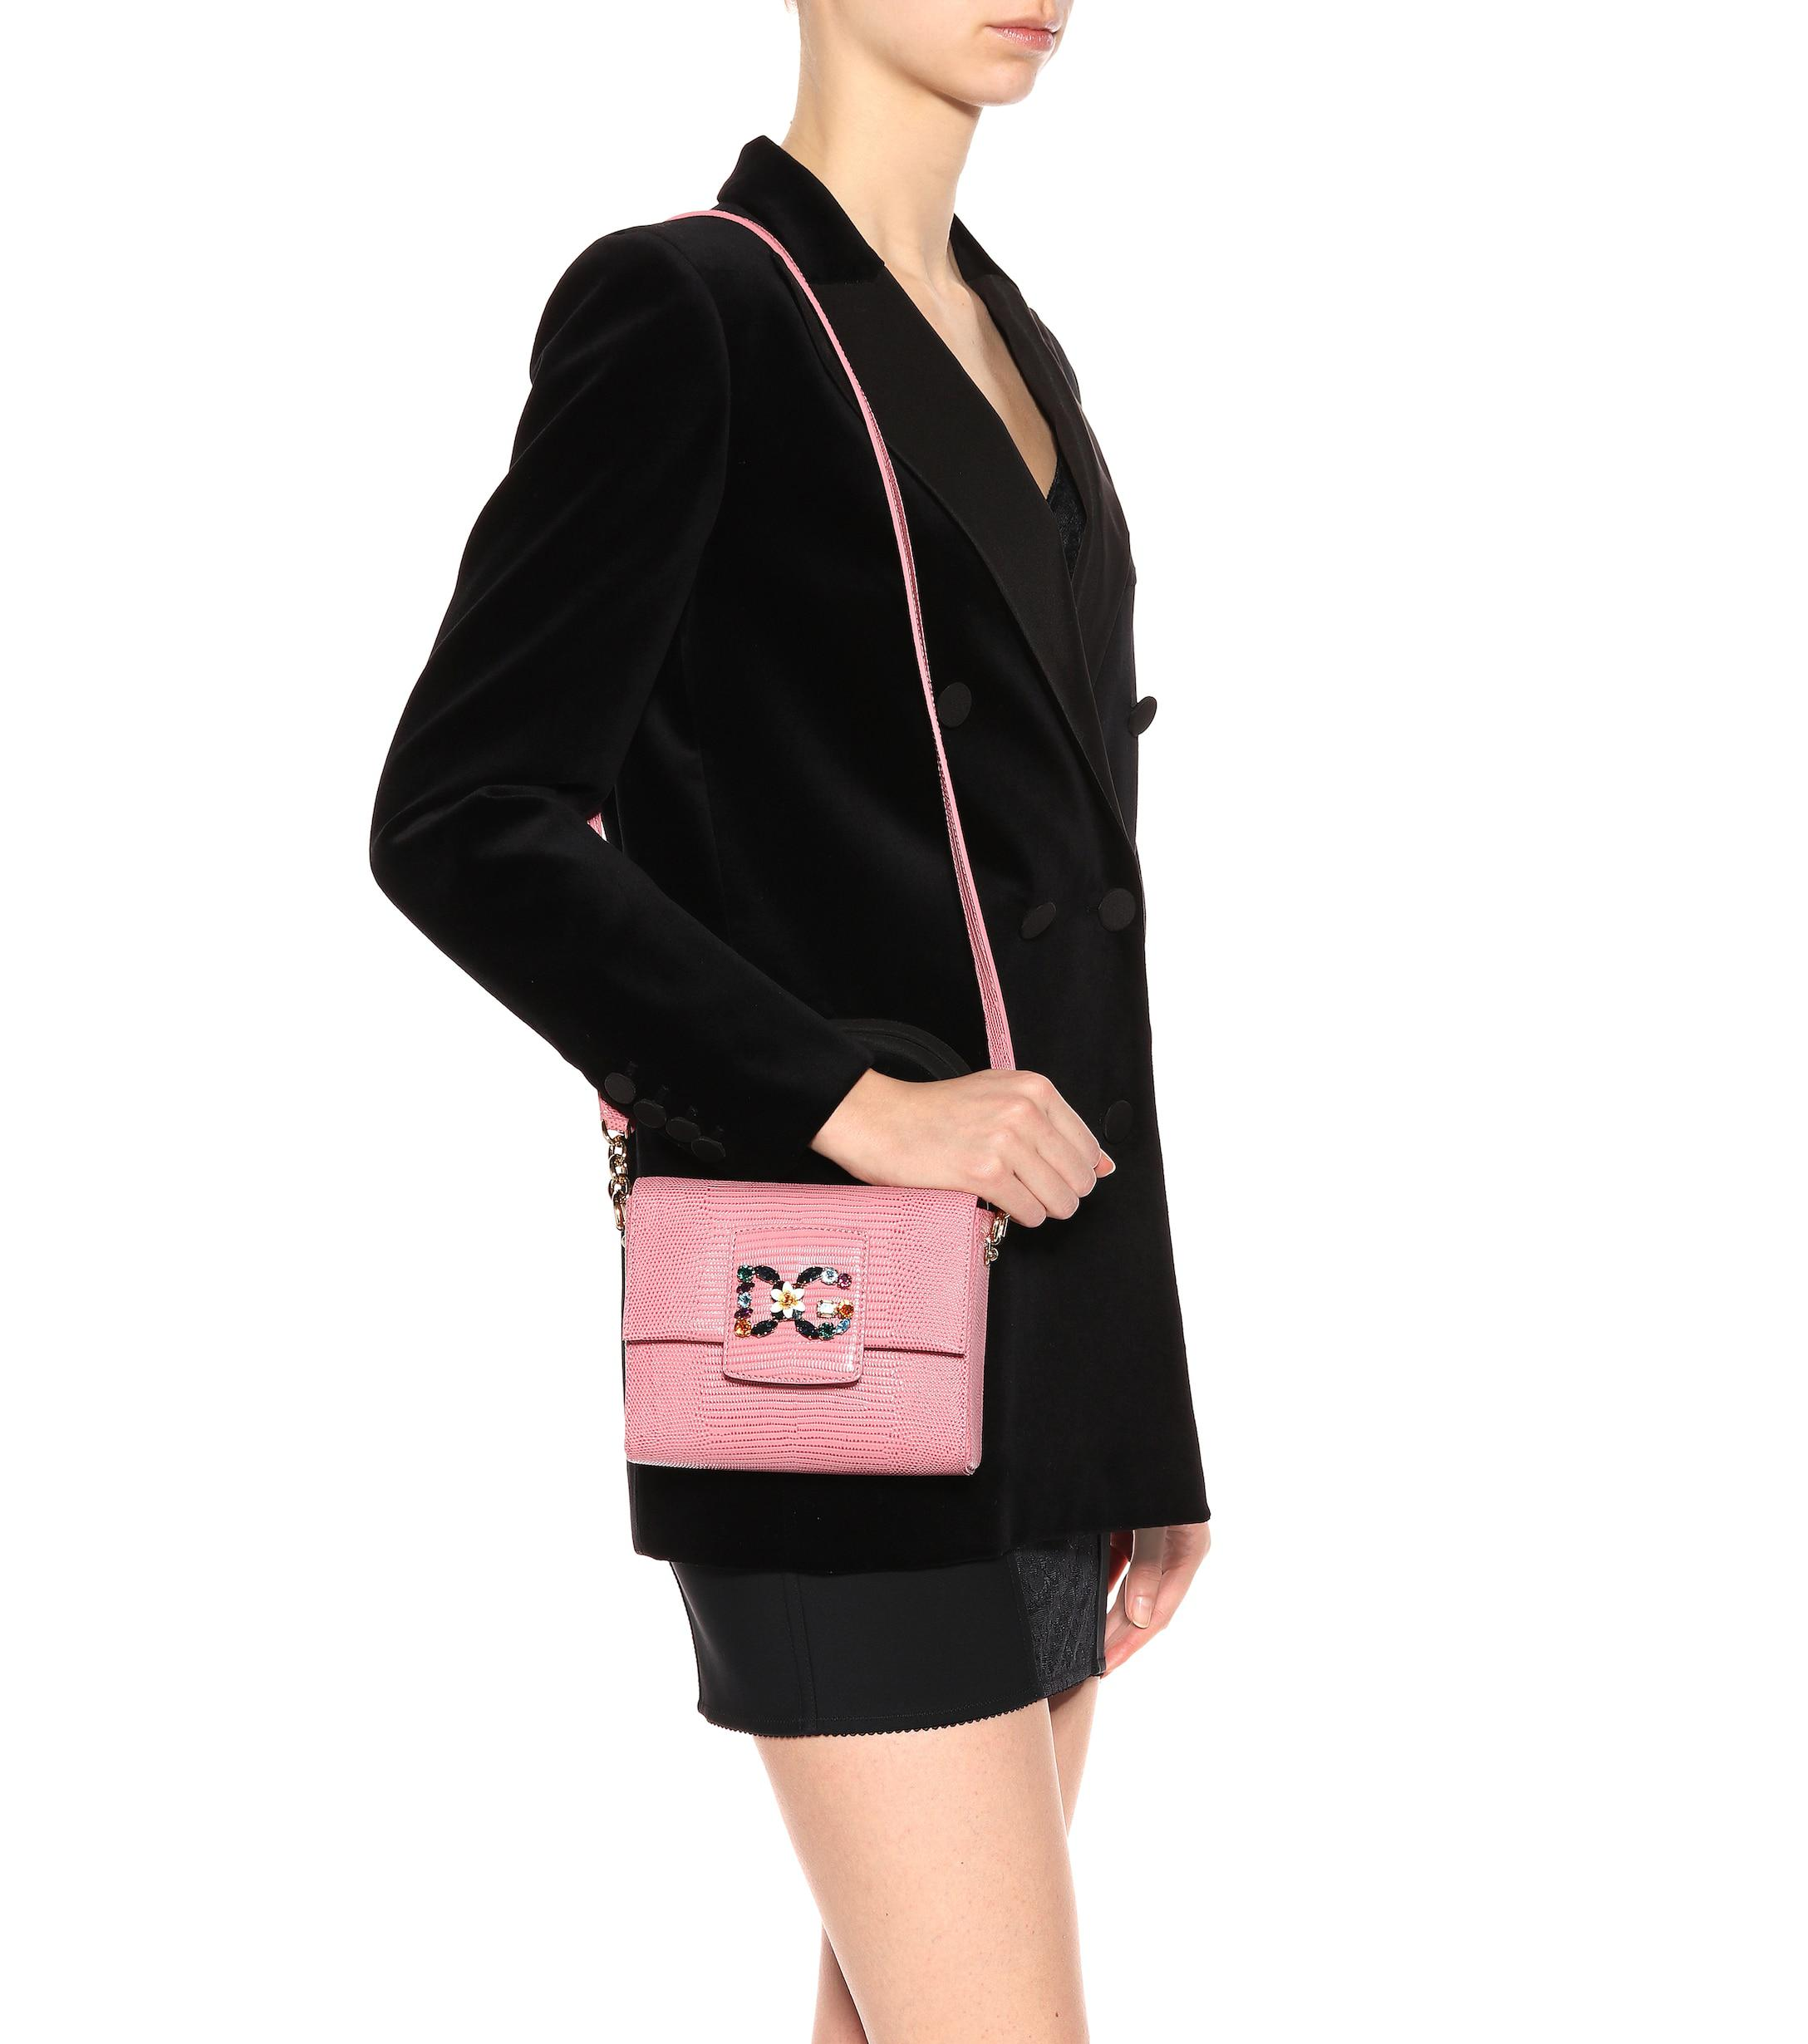 Dolce   Gabbana - Pink Dg Millennials Mini Leather Shoulder Bag - Lyst.  View fullscreen 26630b993e0ff